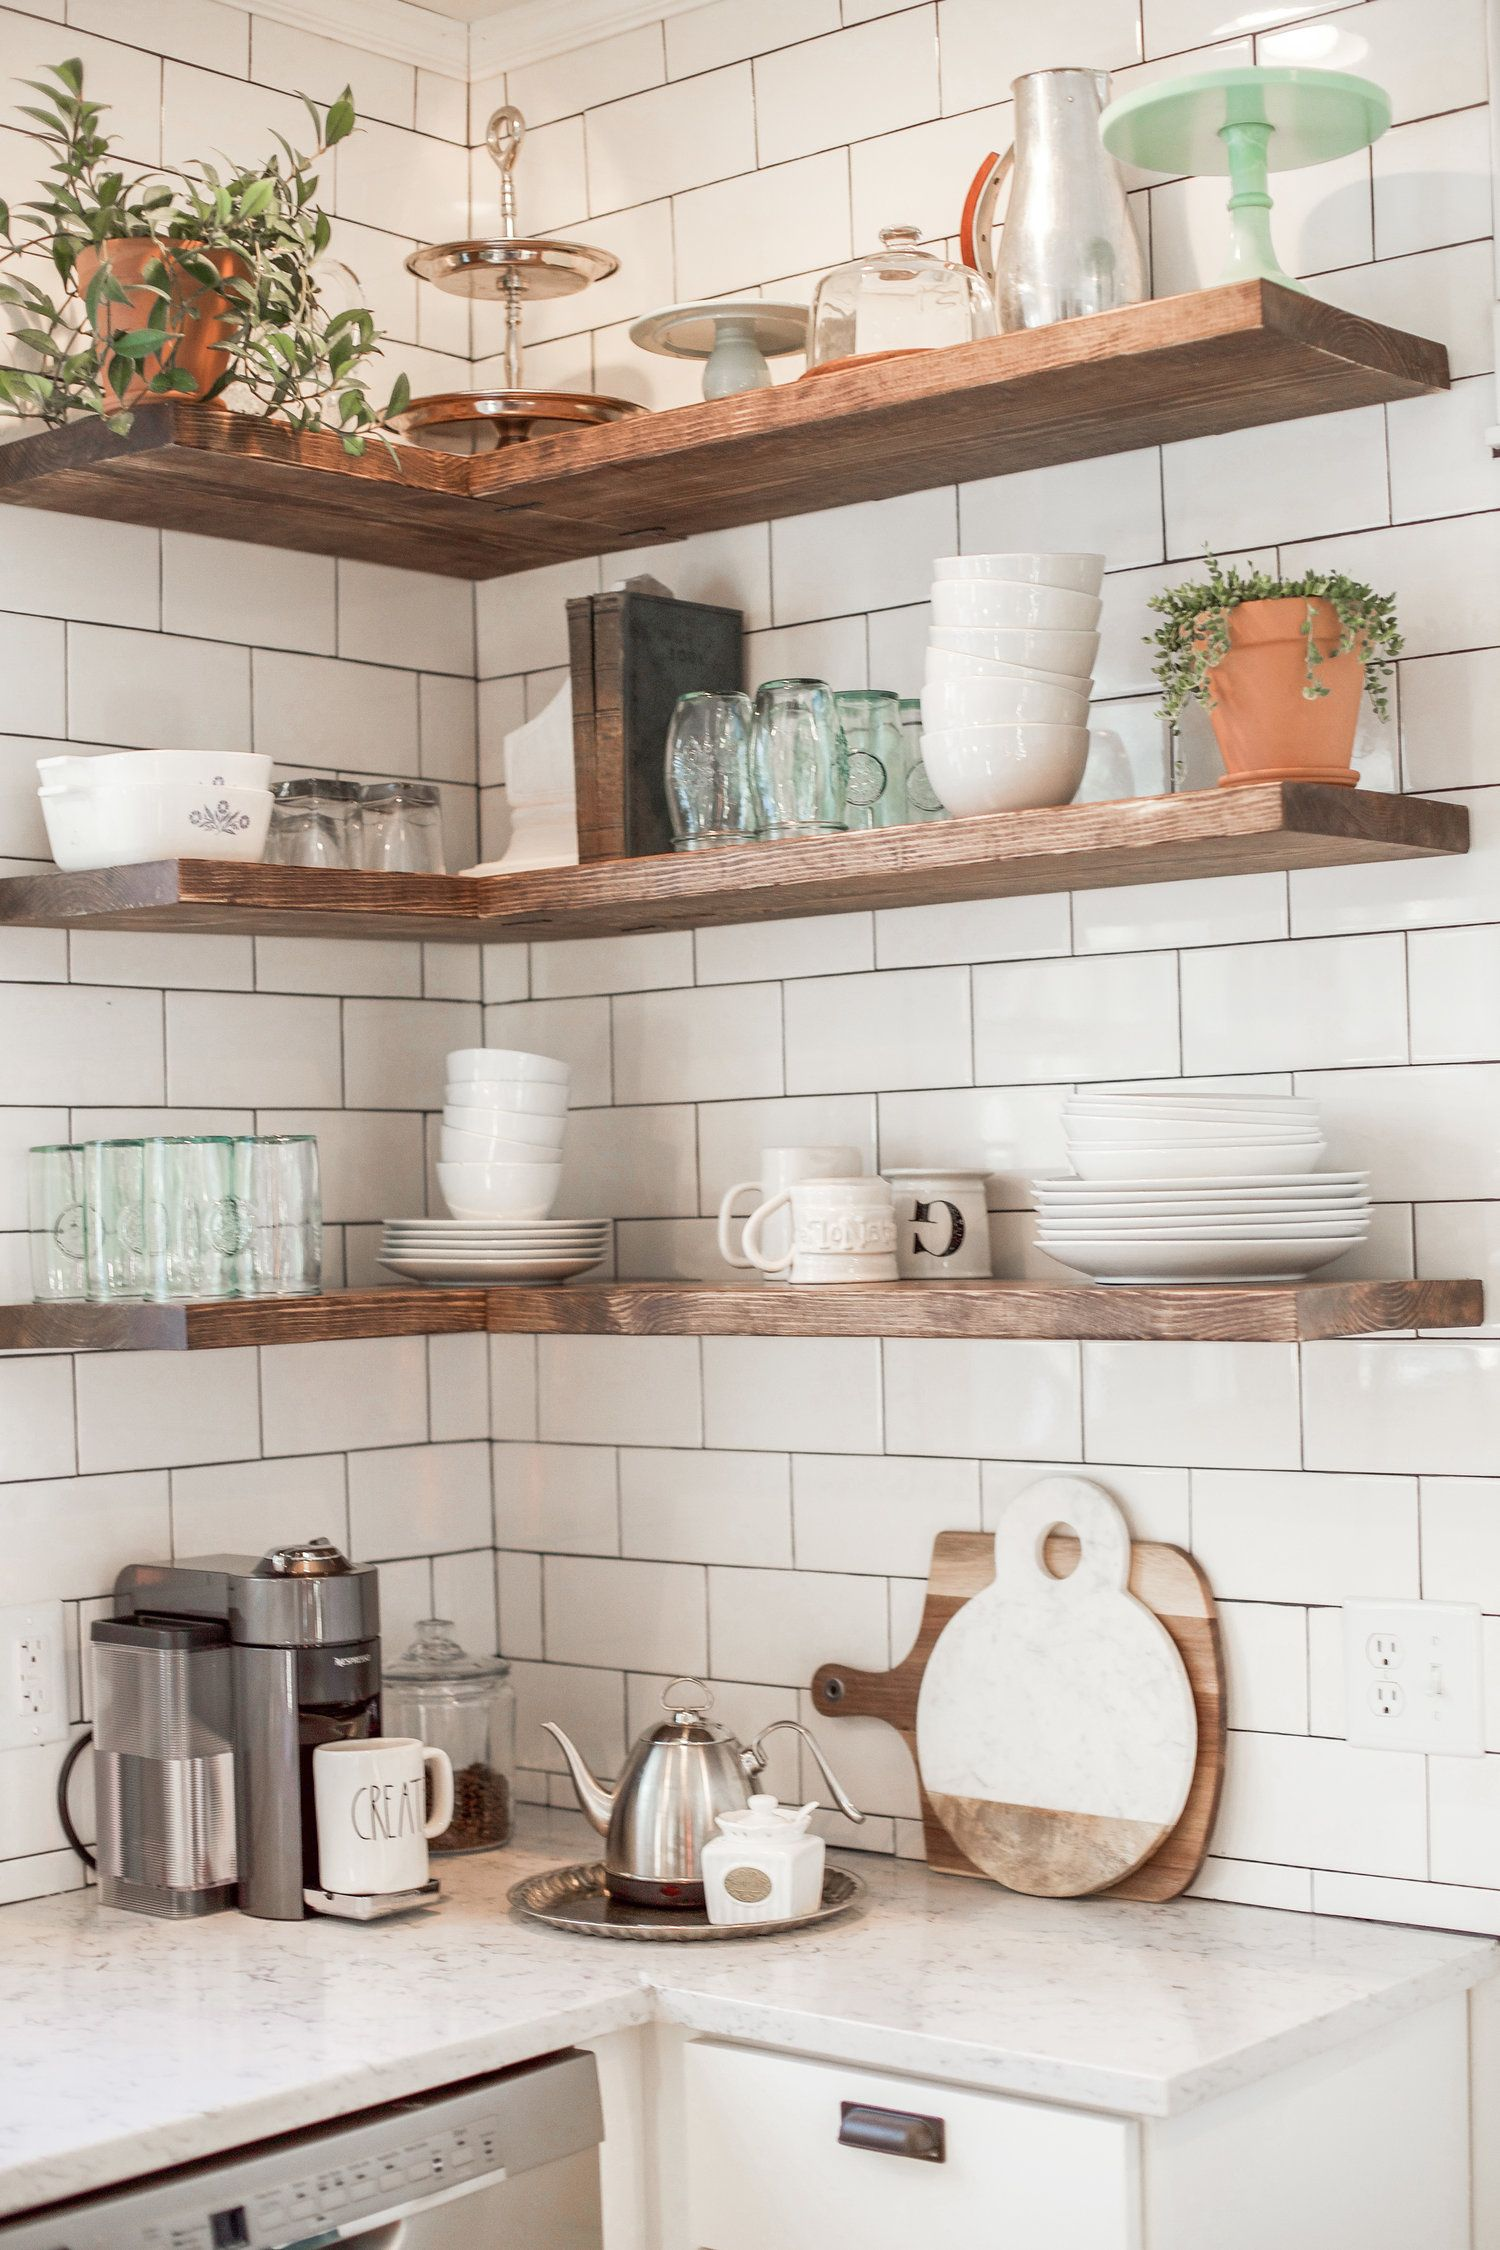 Our Restored Farmhouse Kitchen Reveal | Beach kitchen decor ...